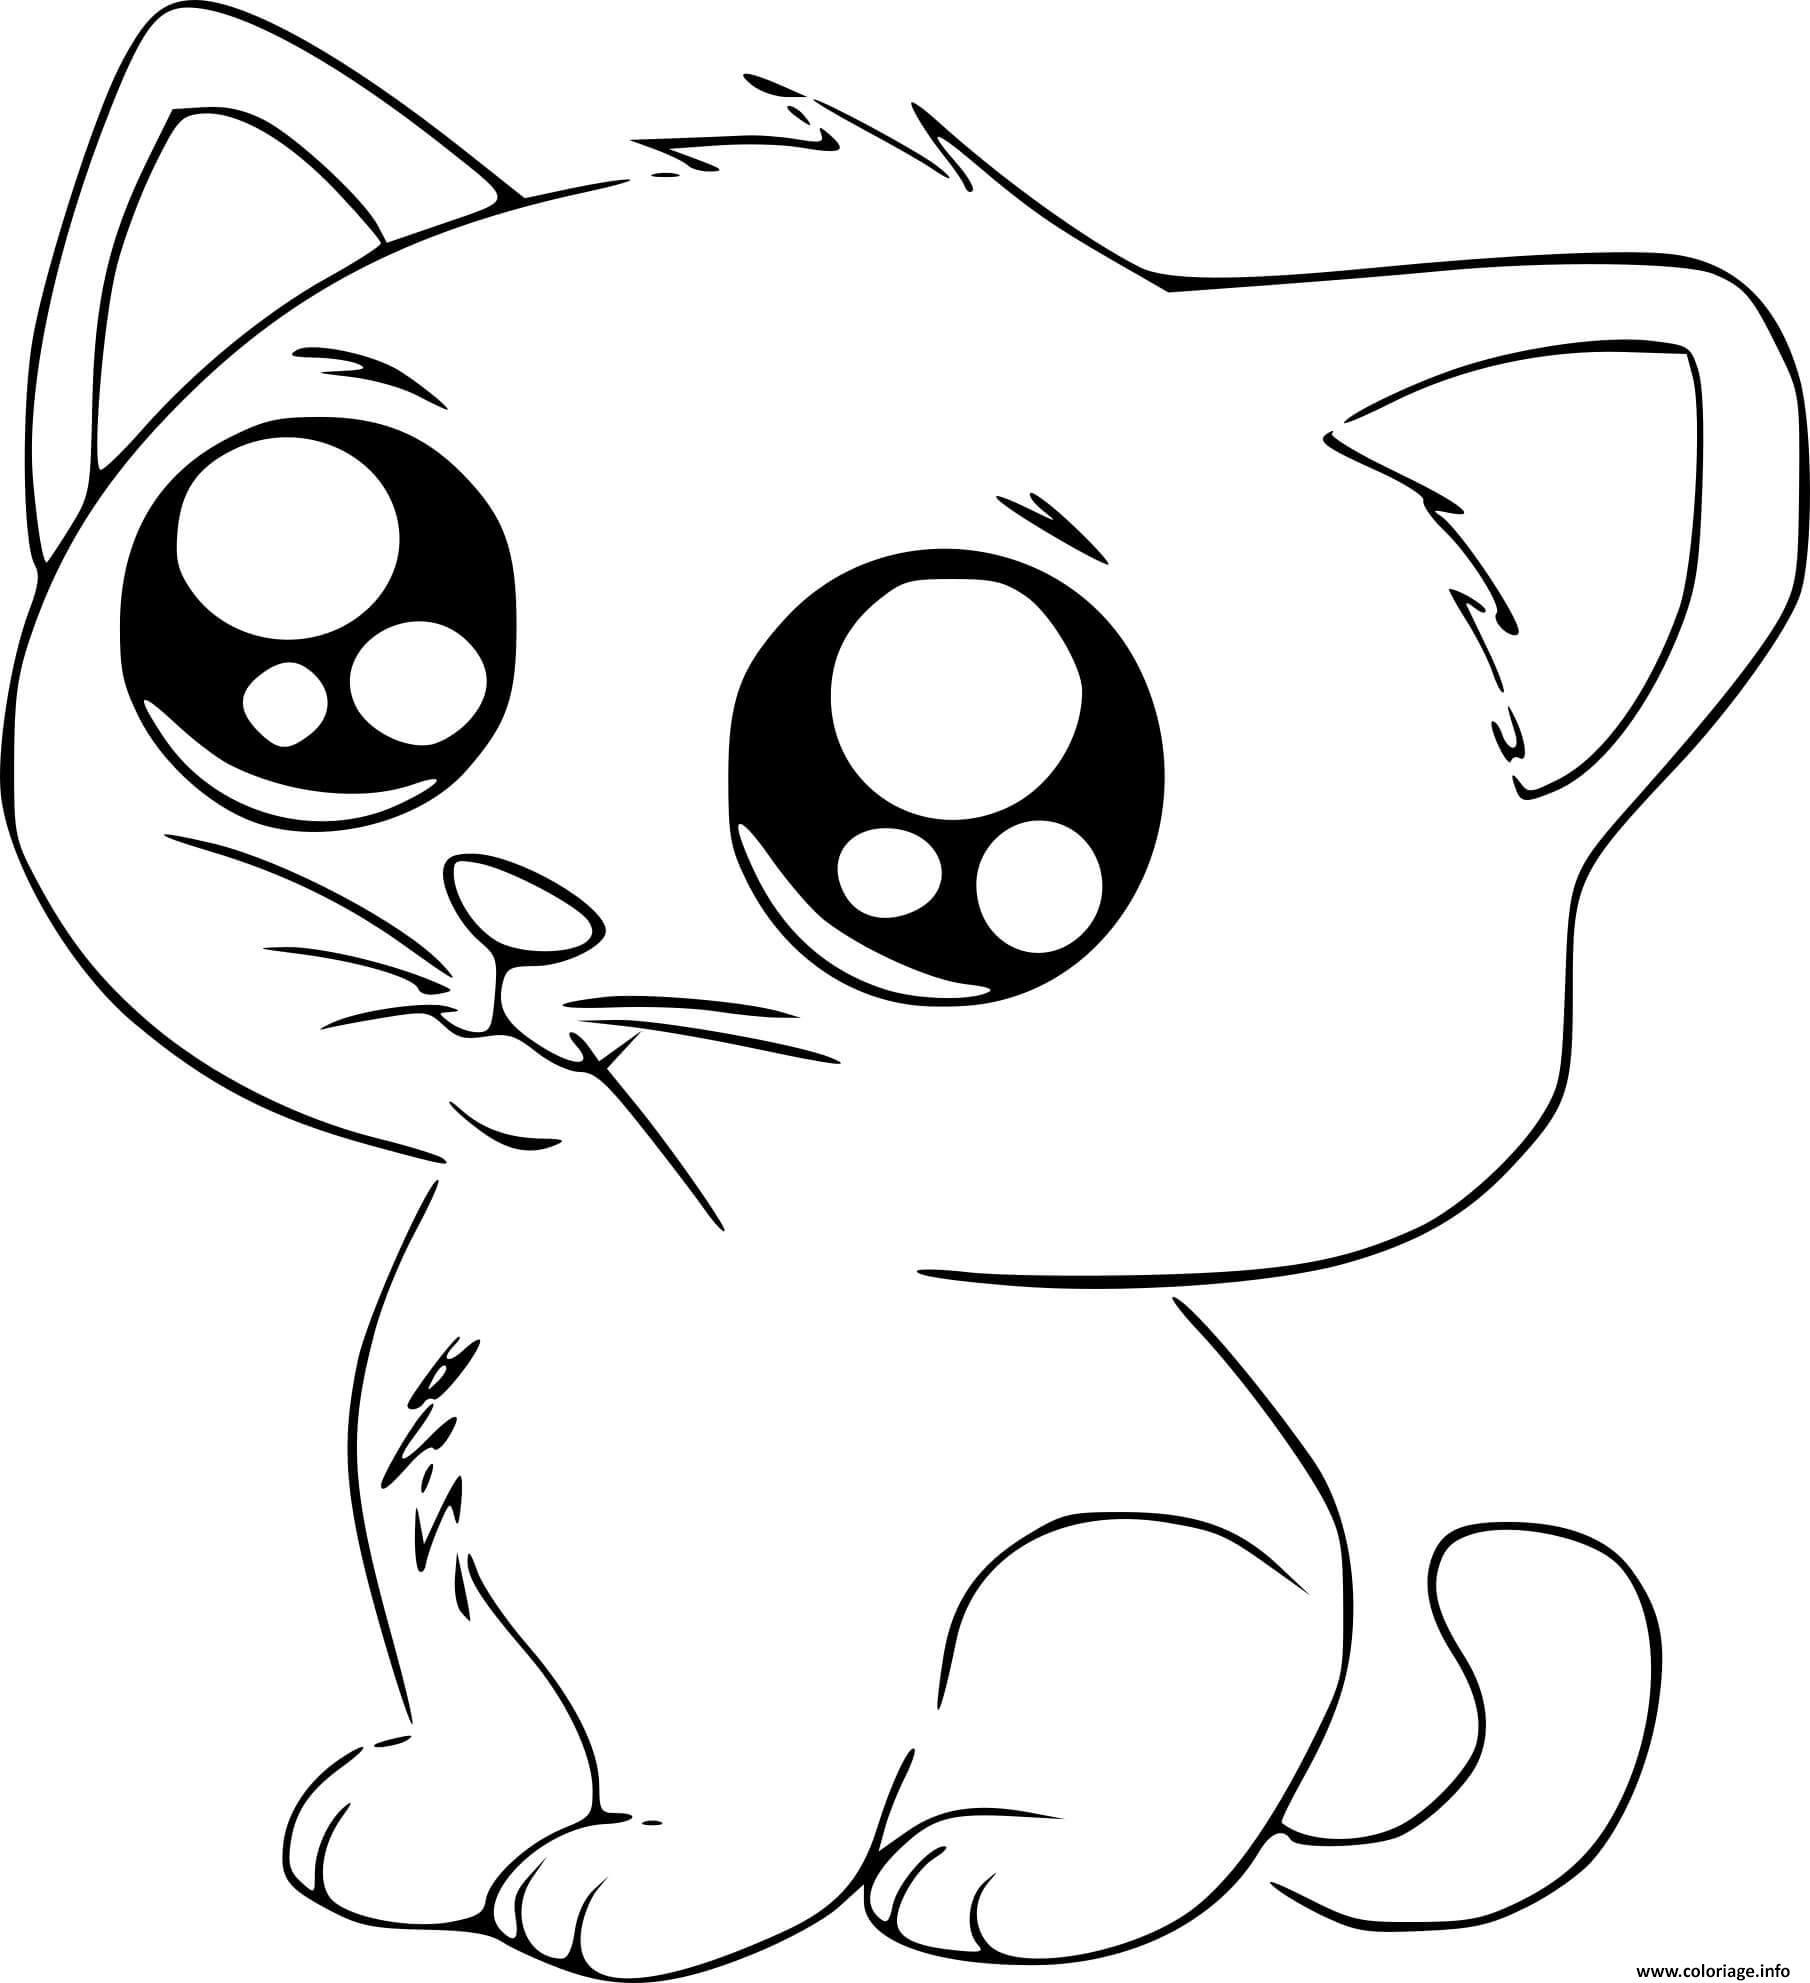 Coloriage Chat Kawaii Manga Mignon Jecolorie Com